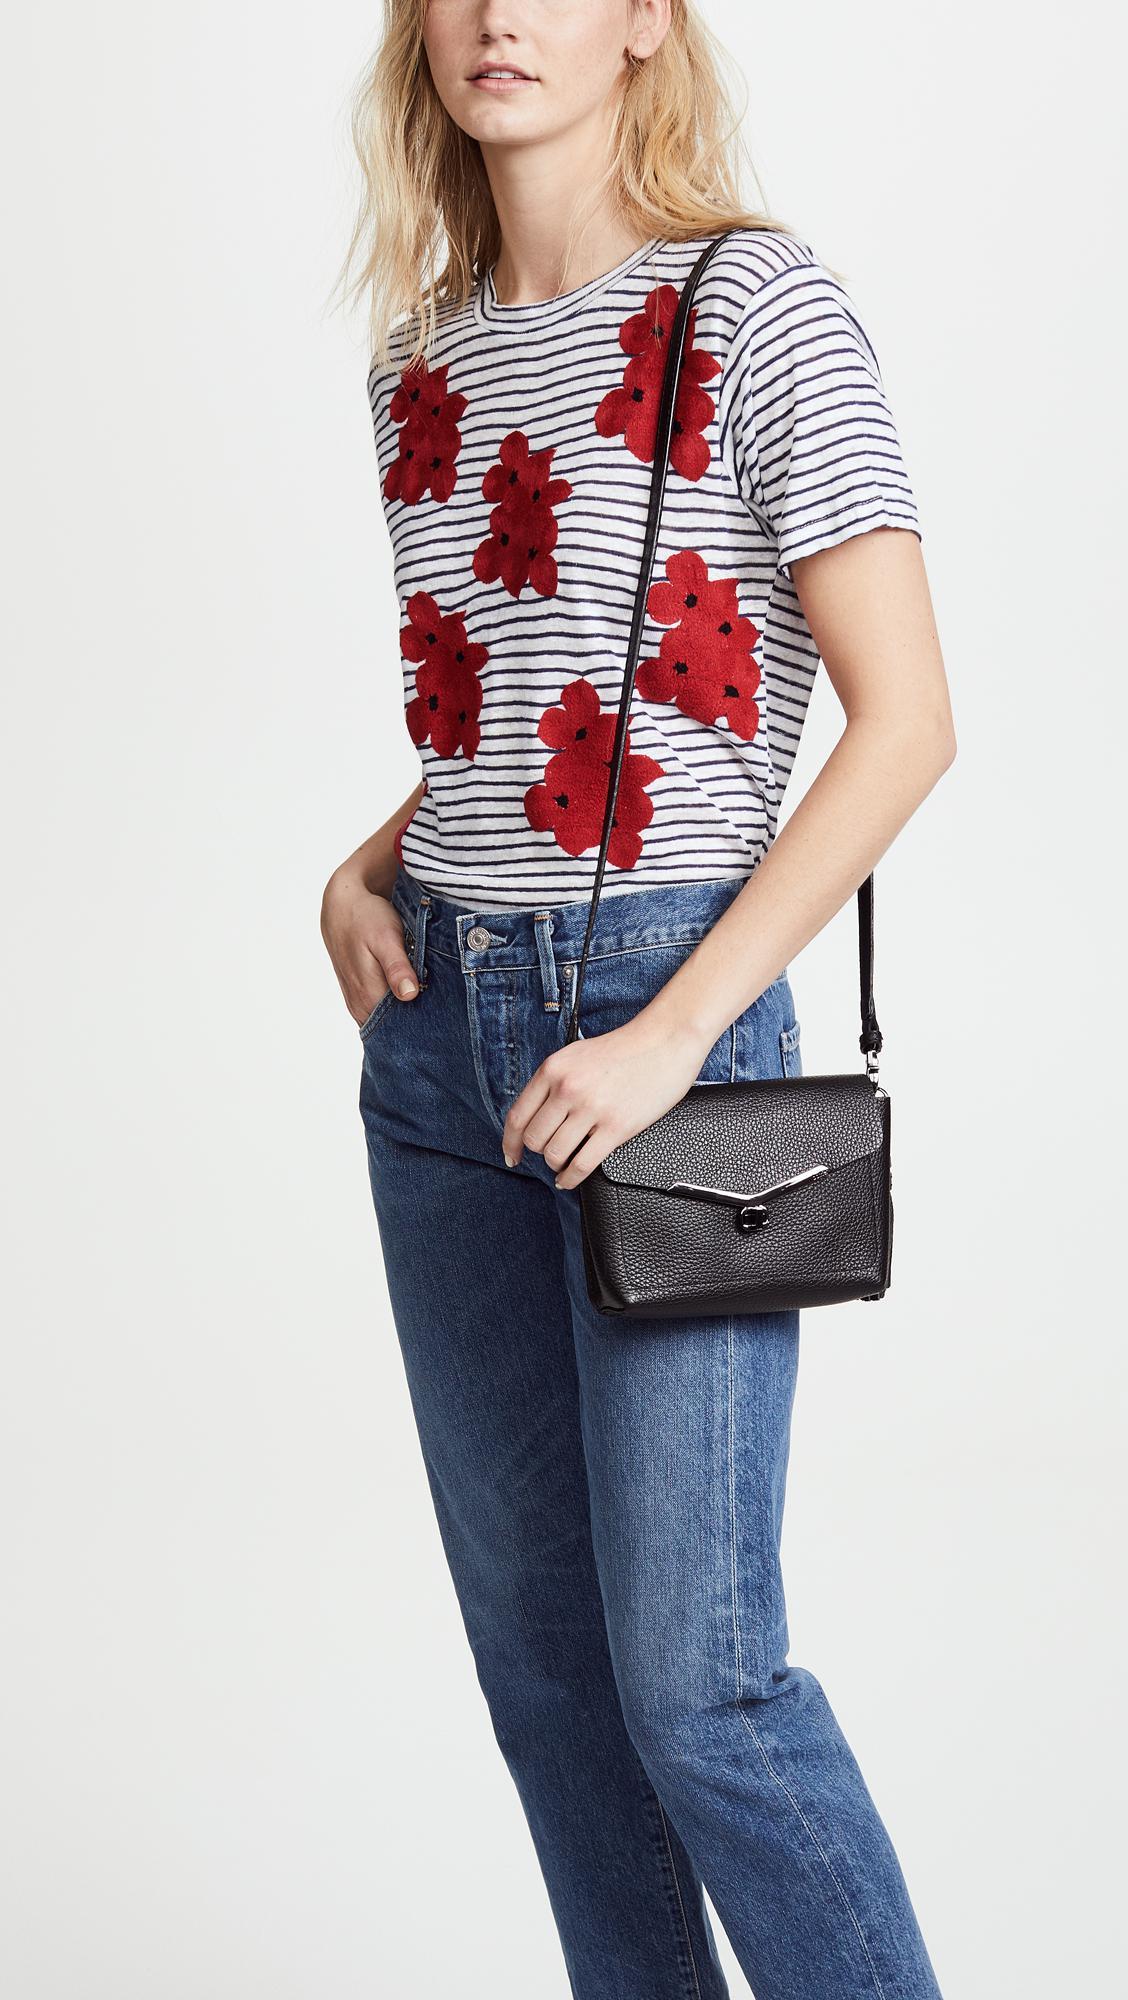 Vivi Cross Body Bag Botkier Shopping Online Cheap Price Buy Cheap Top Quality sJdXa2LUta